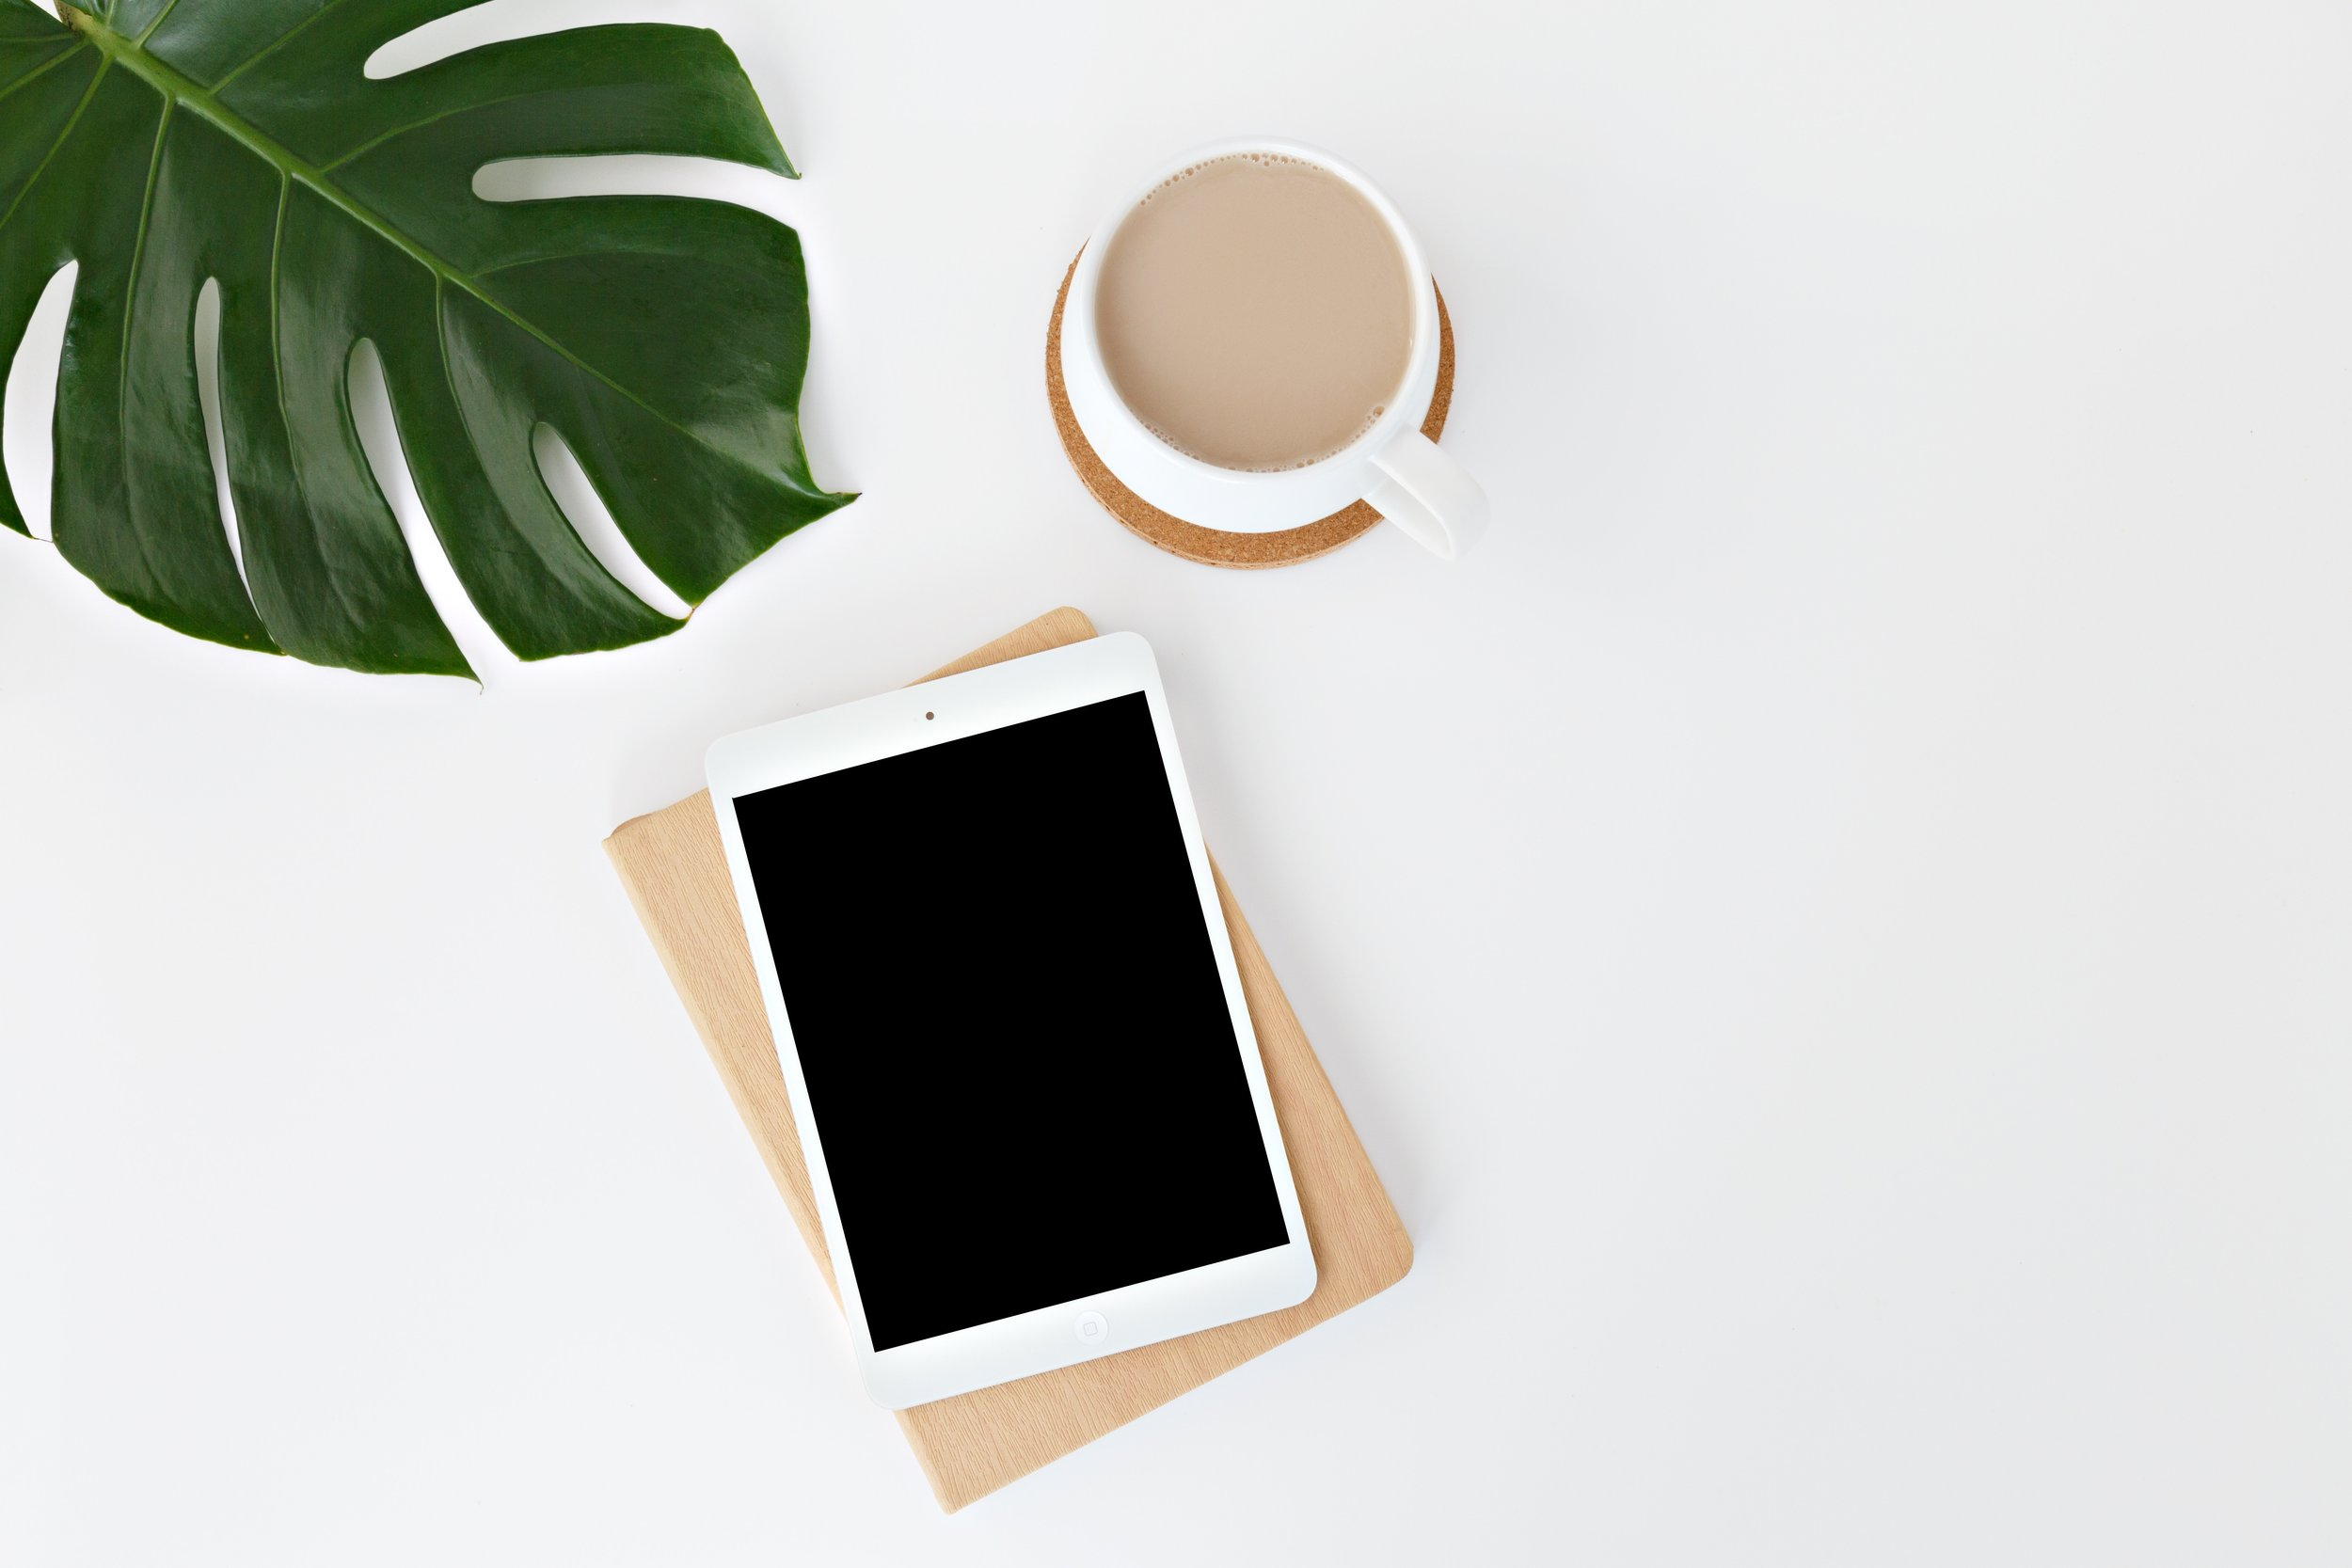 Blogs & Guides - Per hour or per post